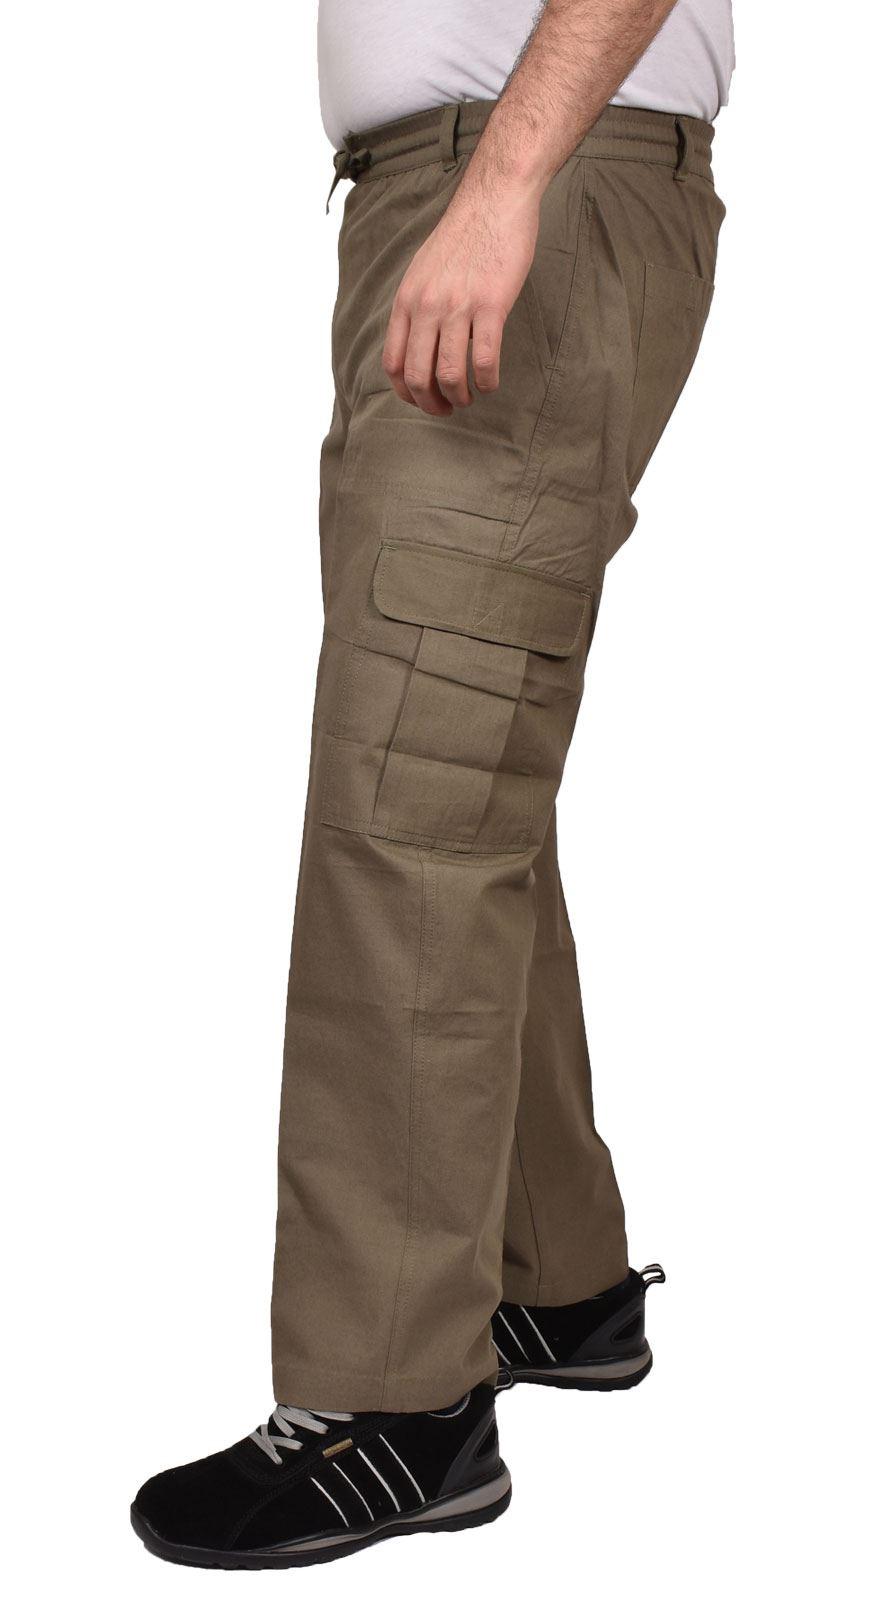 Para-Hombre-De-Carga-Combate-Pantalones-De-Trabajo-Bolsillos-Patrulla-Tactico-Pro-Algodon-Pantalones miniatura 15